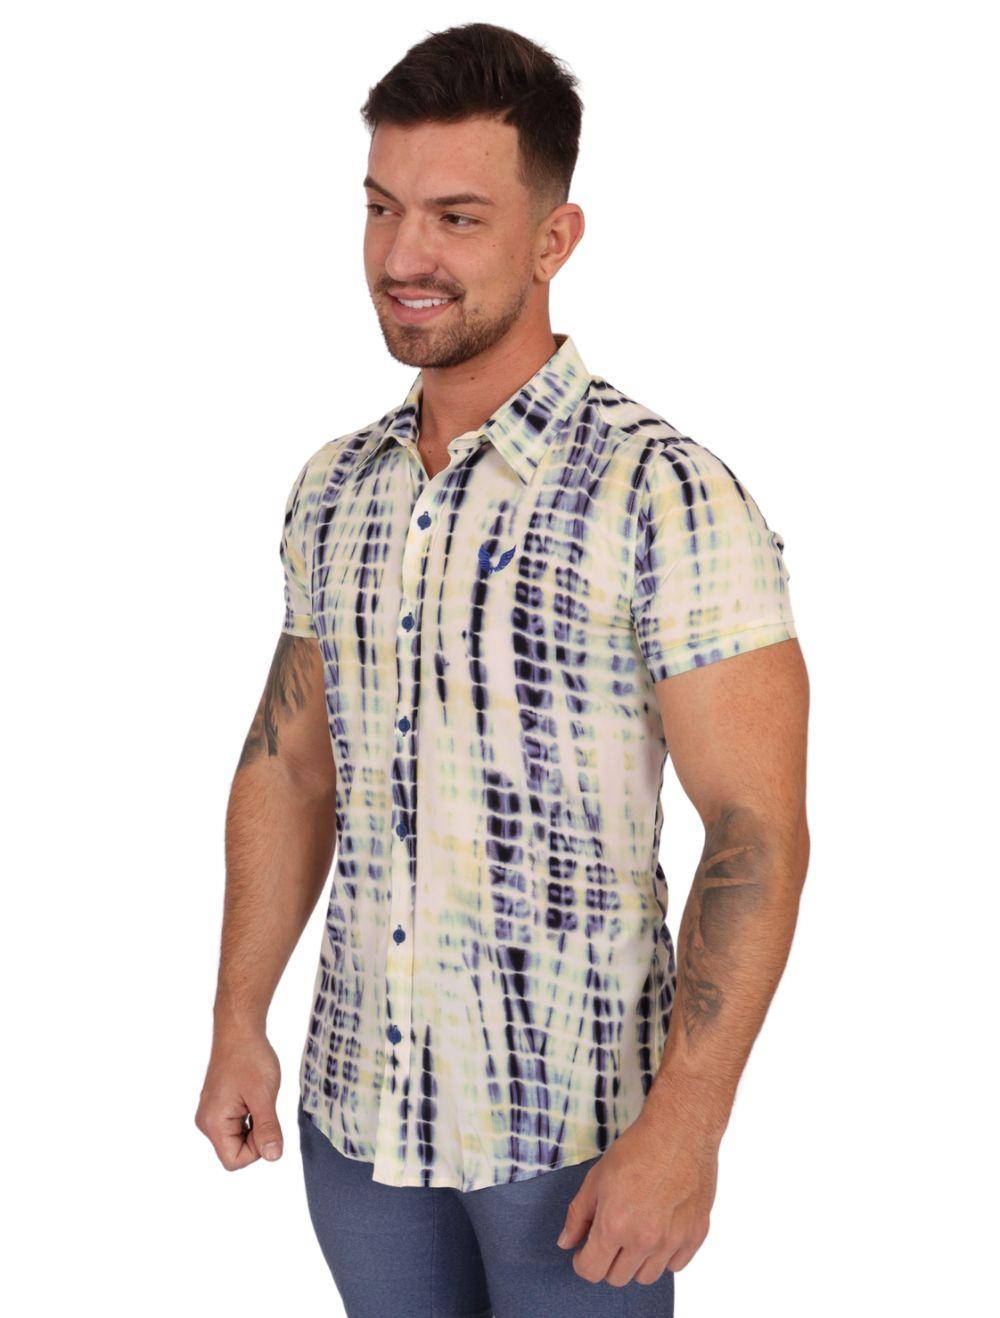 Camisa Masculina Manga Curta Slim com Elastano Creme